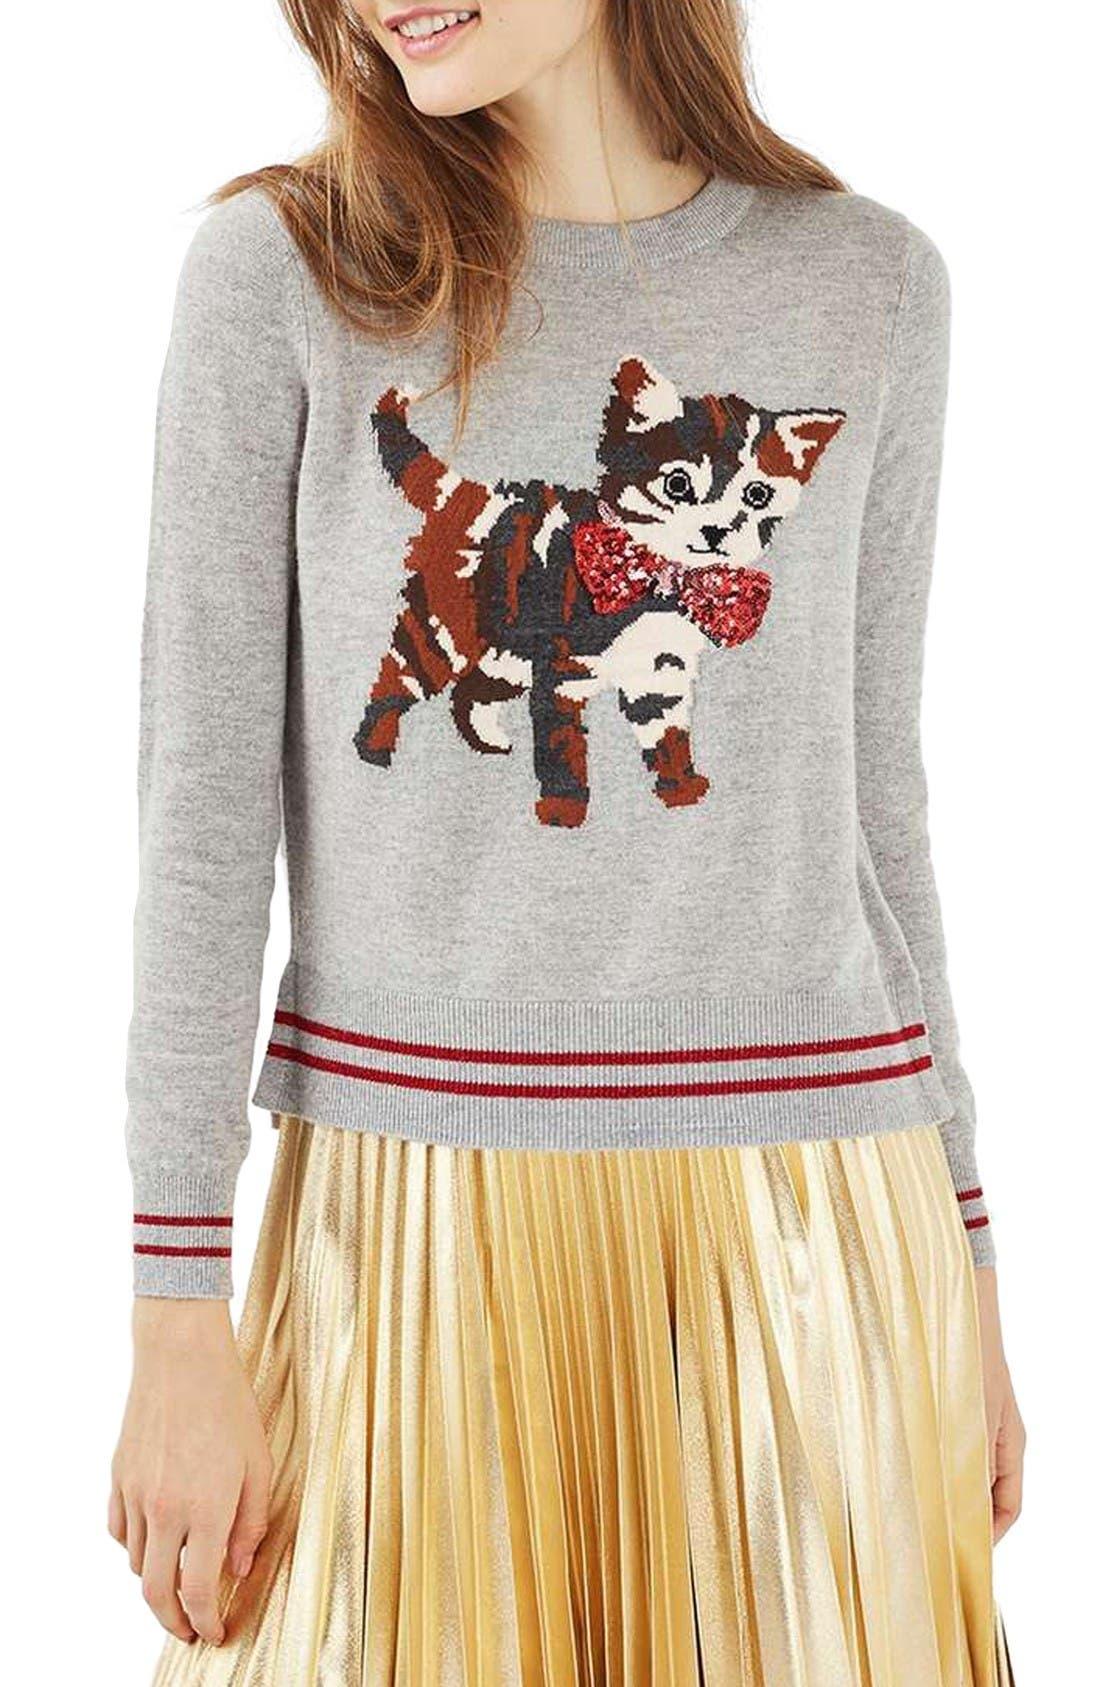 Alternate Image 1 Selected - Topshop Sequin Embellished Cat Sweater (Petite)